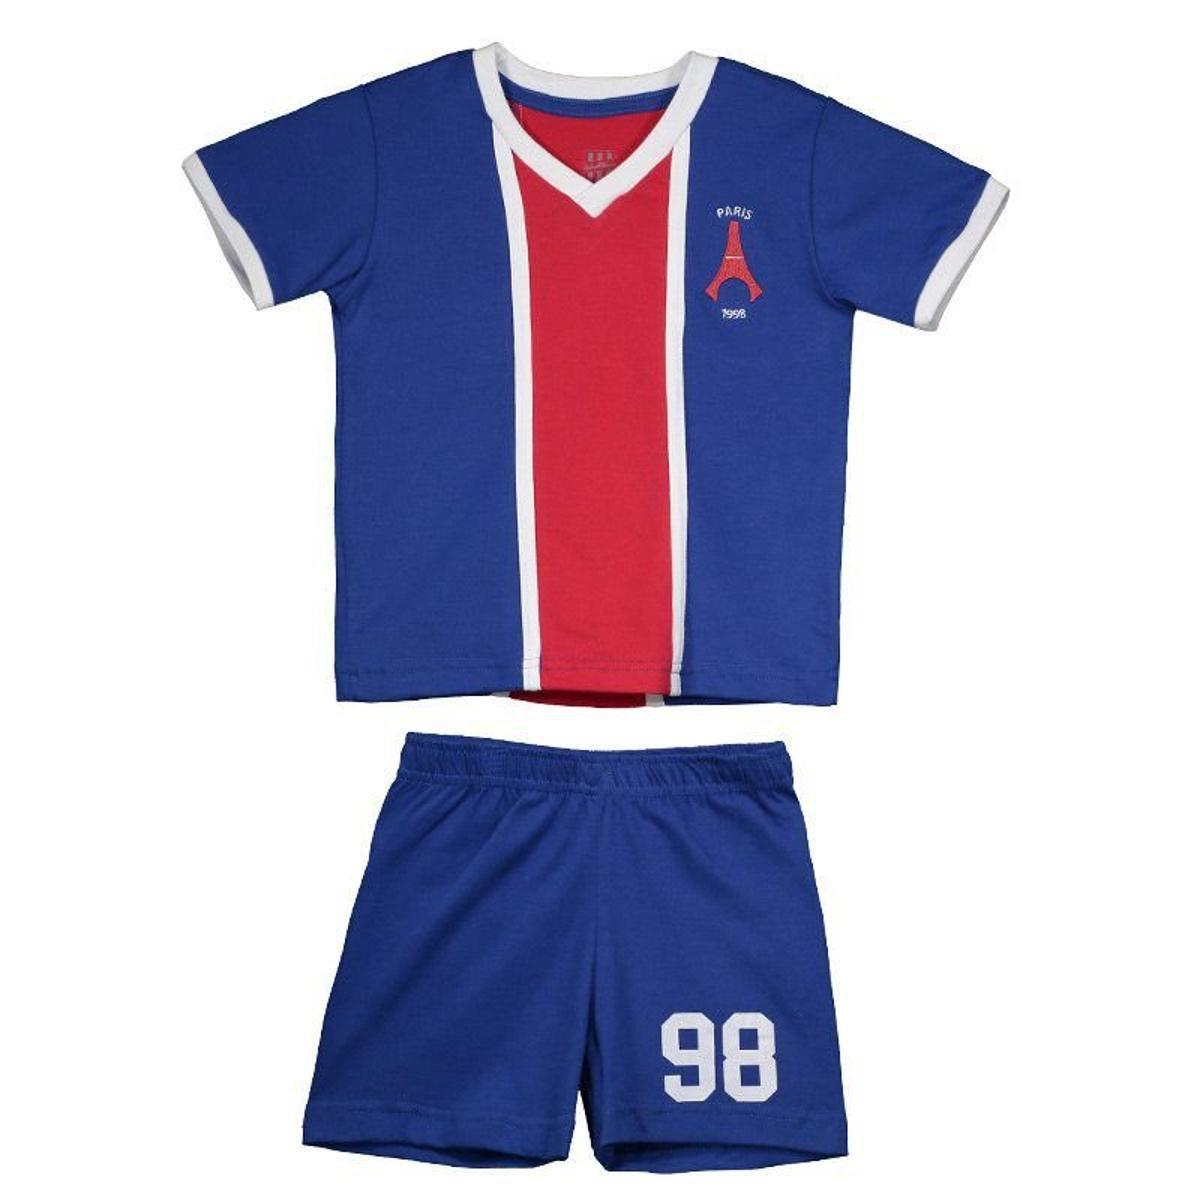 3e7b094cc Kit Infantil Paris Saint-germain Retrô 1998 - Azul - Compre Agora ...